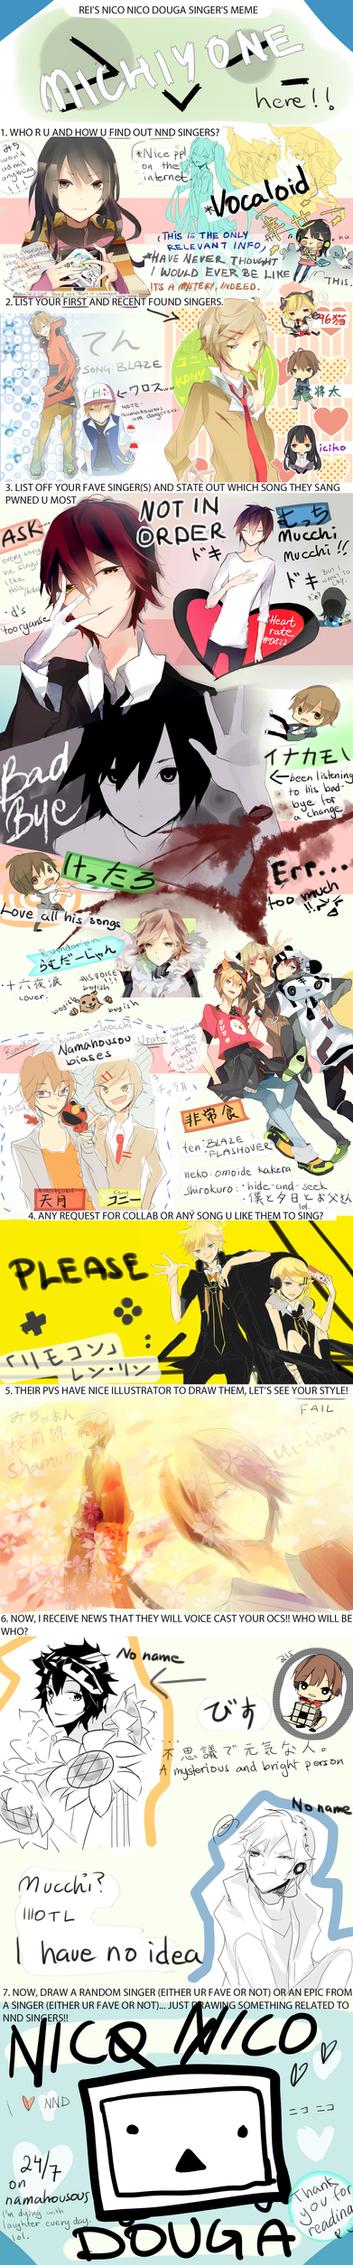 NND Utaite Meme by Michiyone